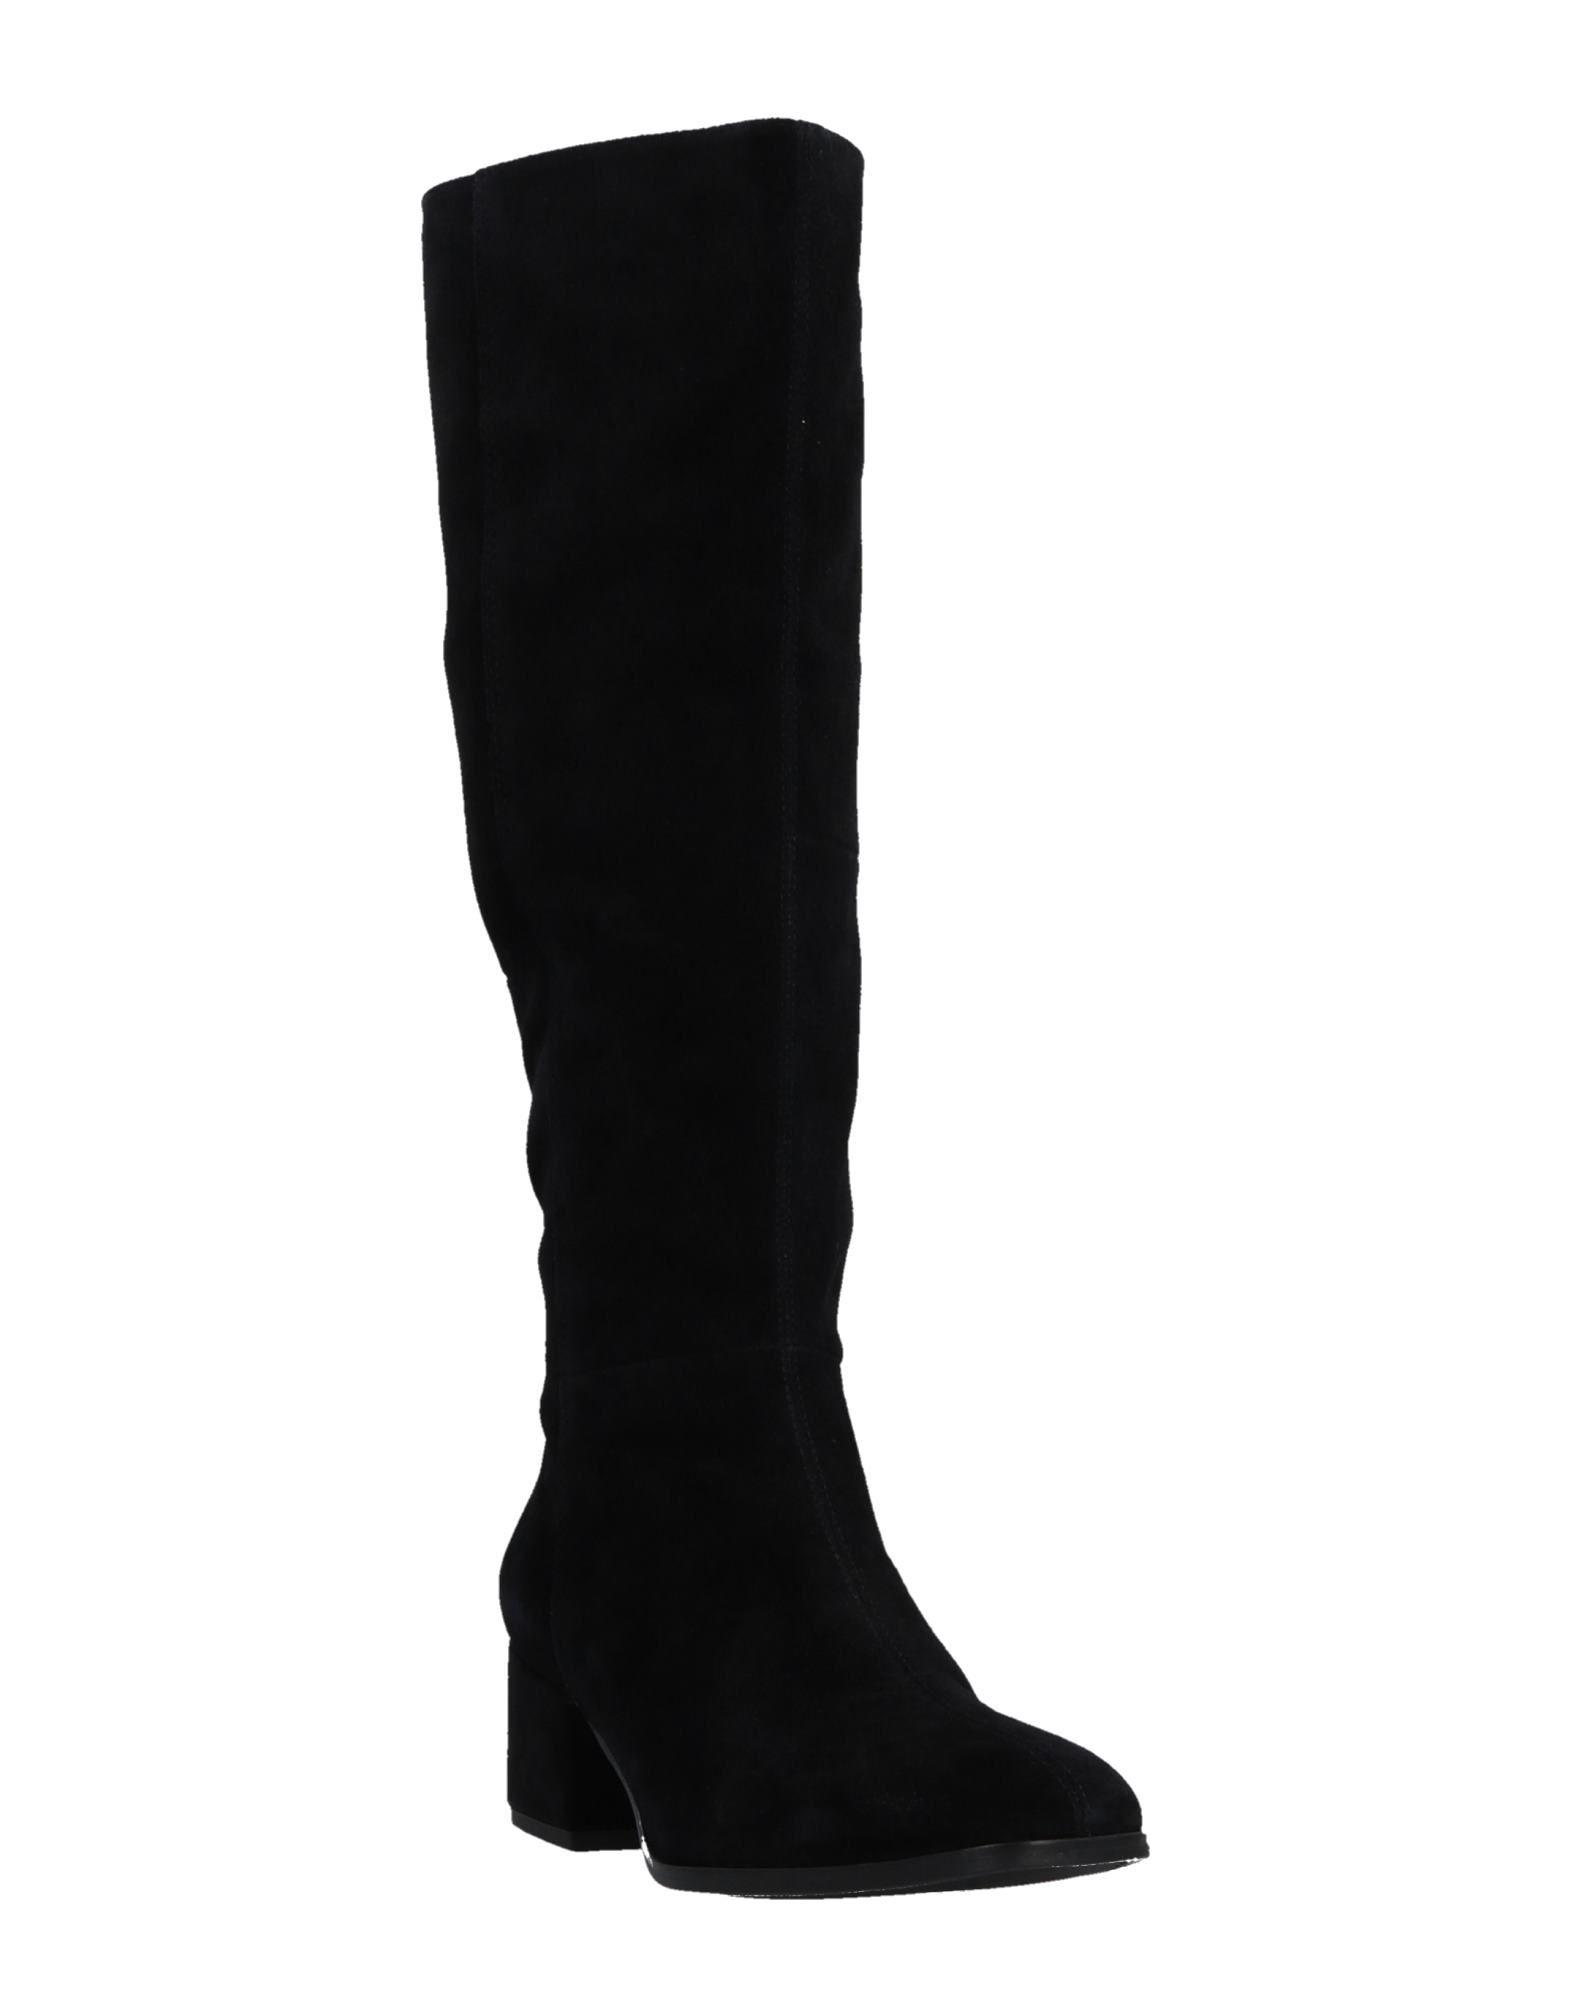 vagabond cordonniers bottes - femmes femmes femmes vagabond cordonniers bottes en ligne sur canada 675b55